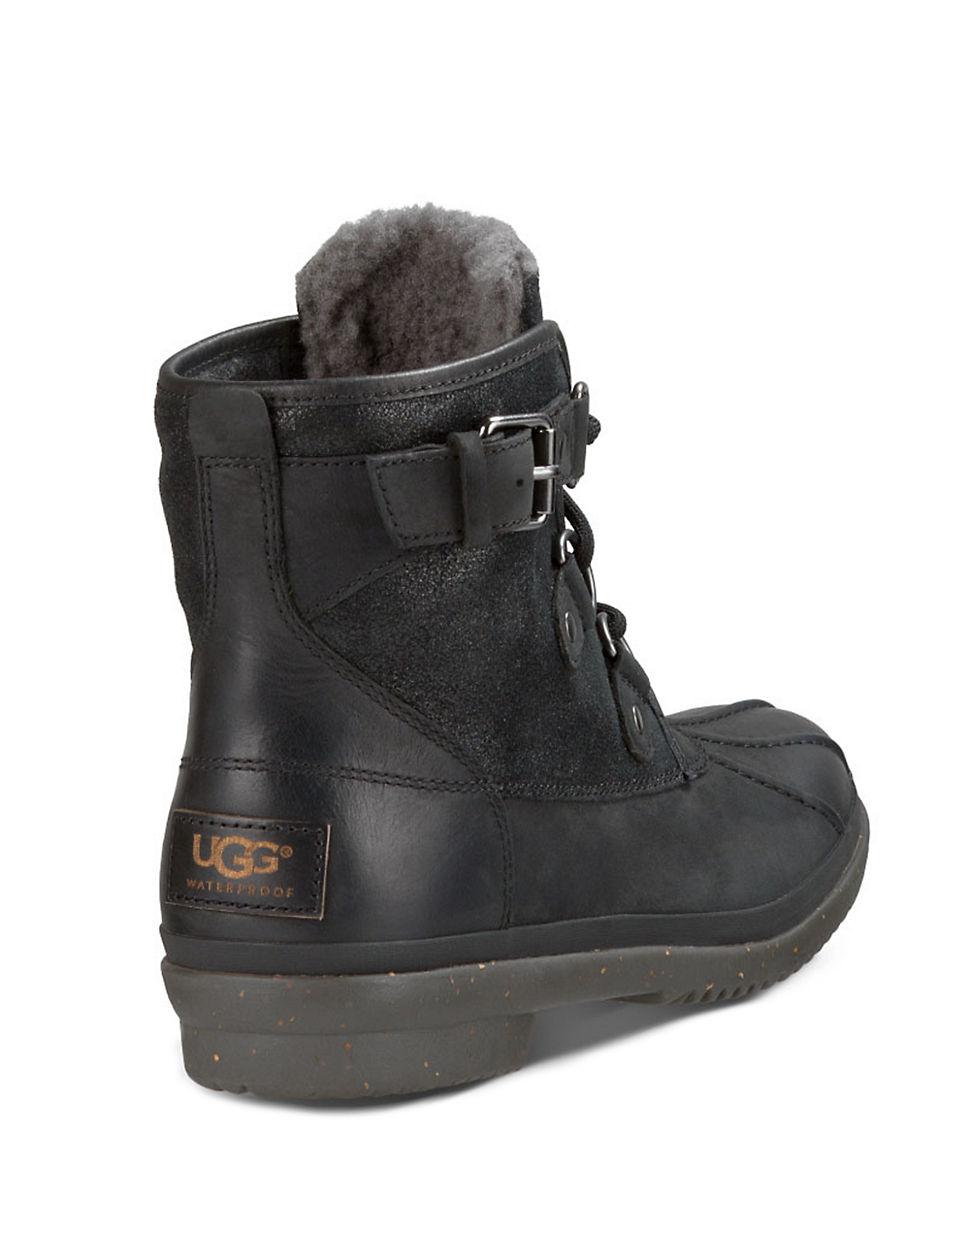 cbafeca8210 Uggpure Leather Boots | Ústav konkurencieschopnosti a inovácií